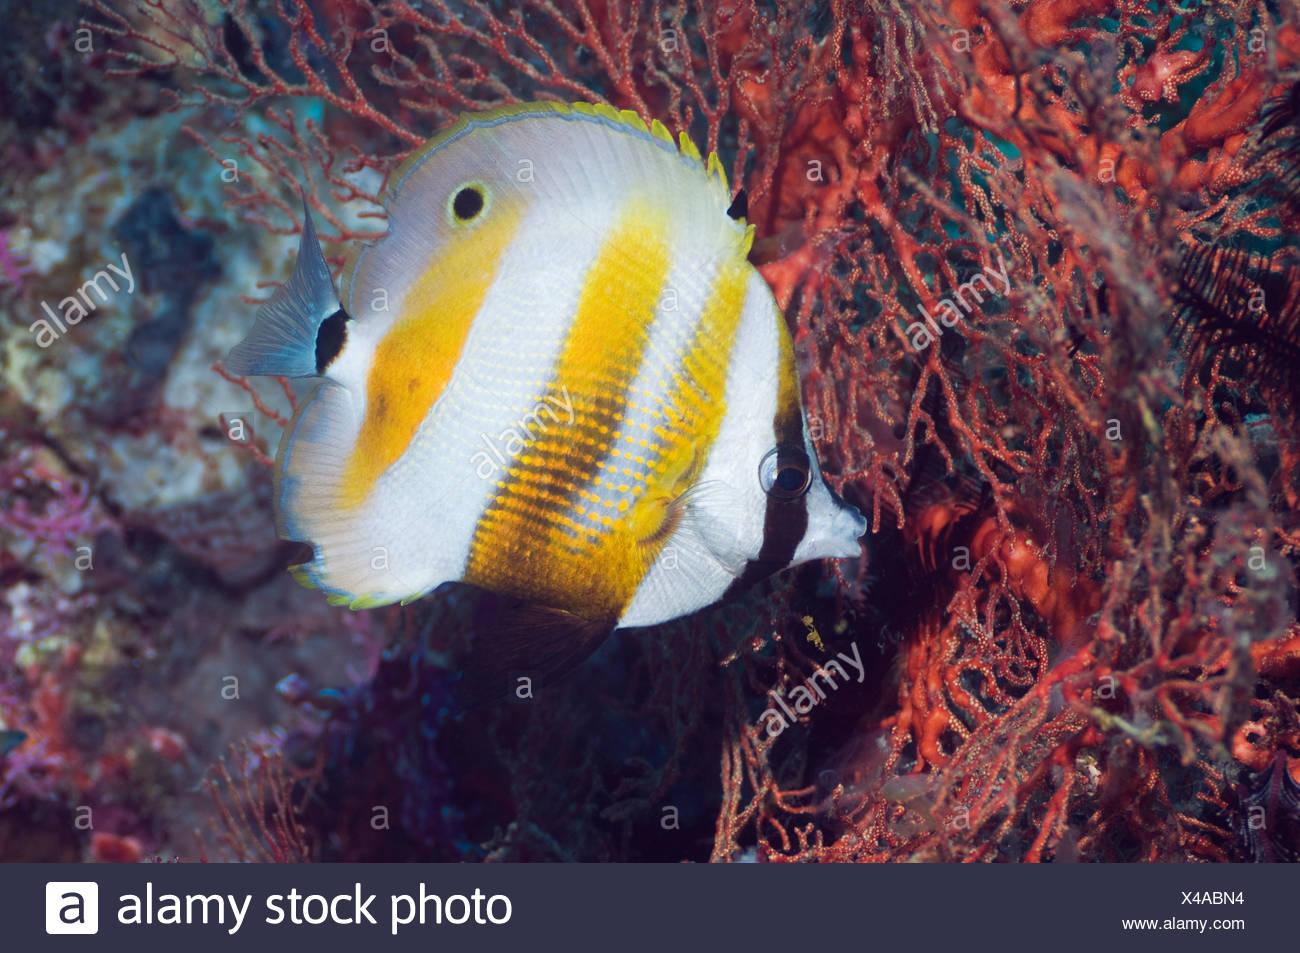 Naranja-banded coralfish alimentándose de pólipos de gorgonias. Misool, Raja Ampat, Papua Occidental, Indonesia. Imagen De Stock